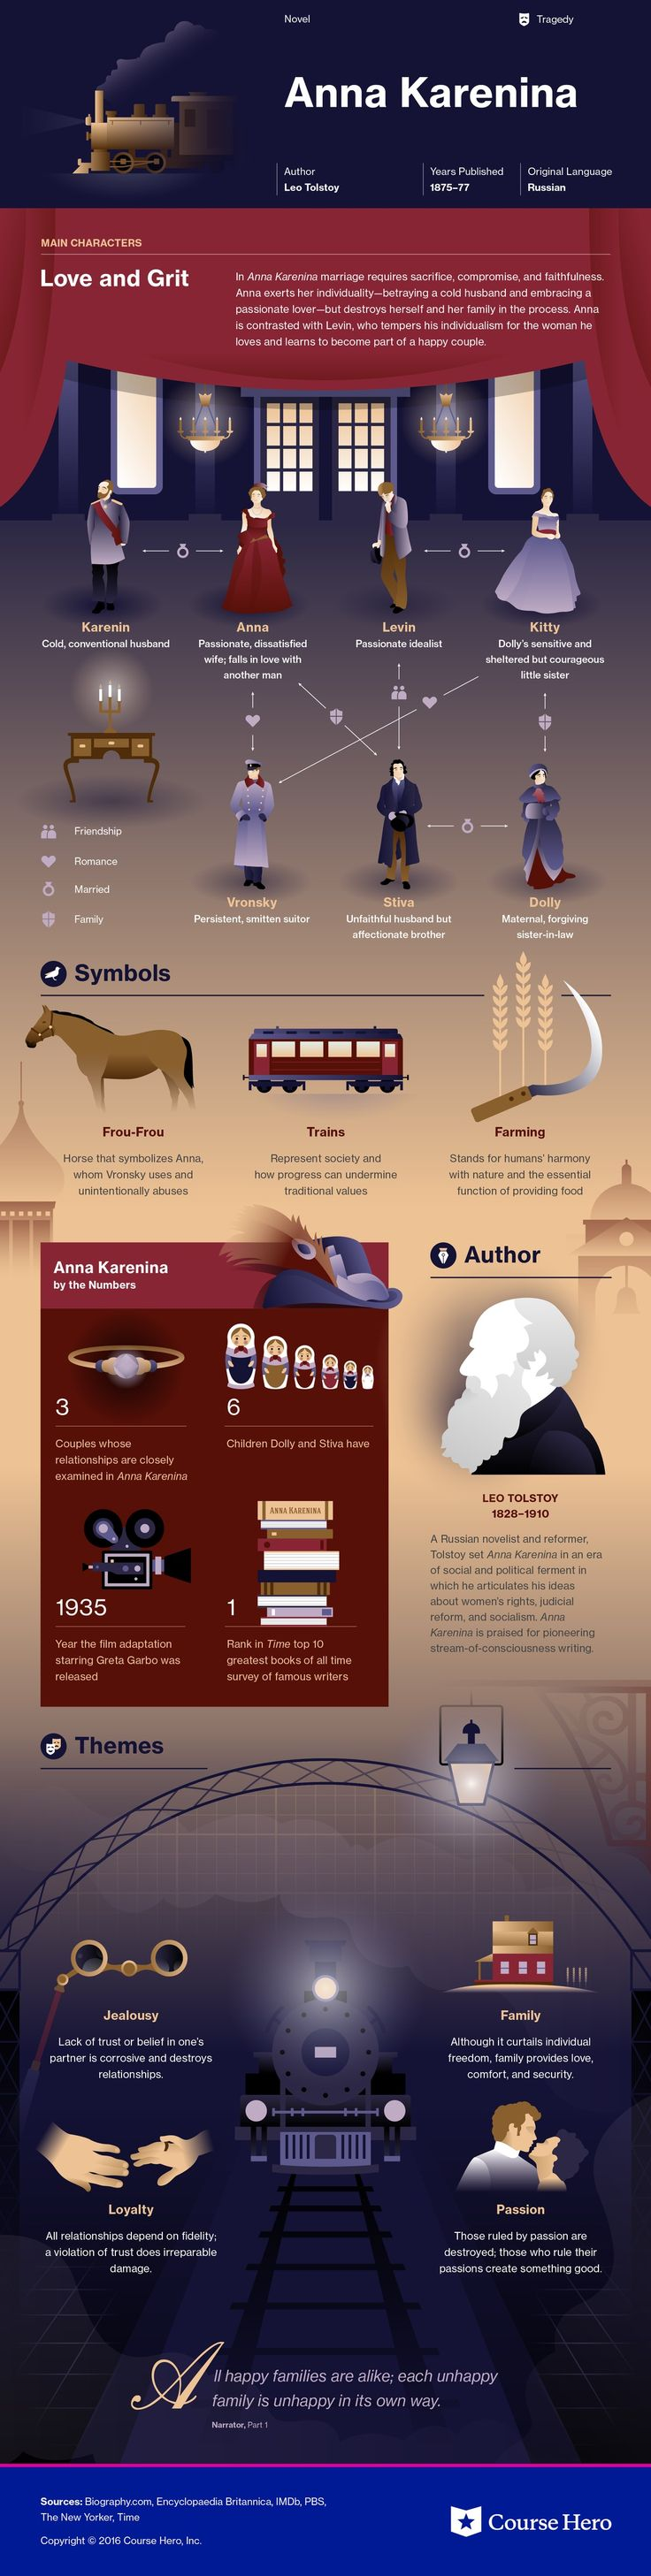 Anna Karenina Infographic | Course Hero